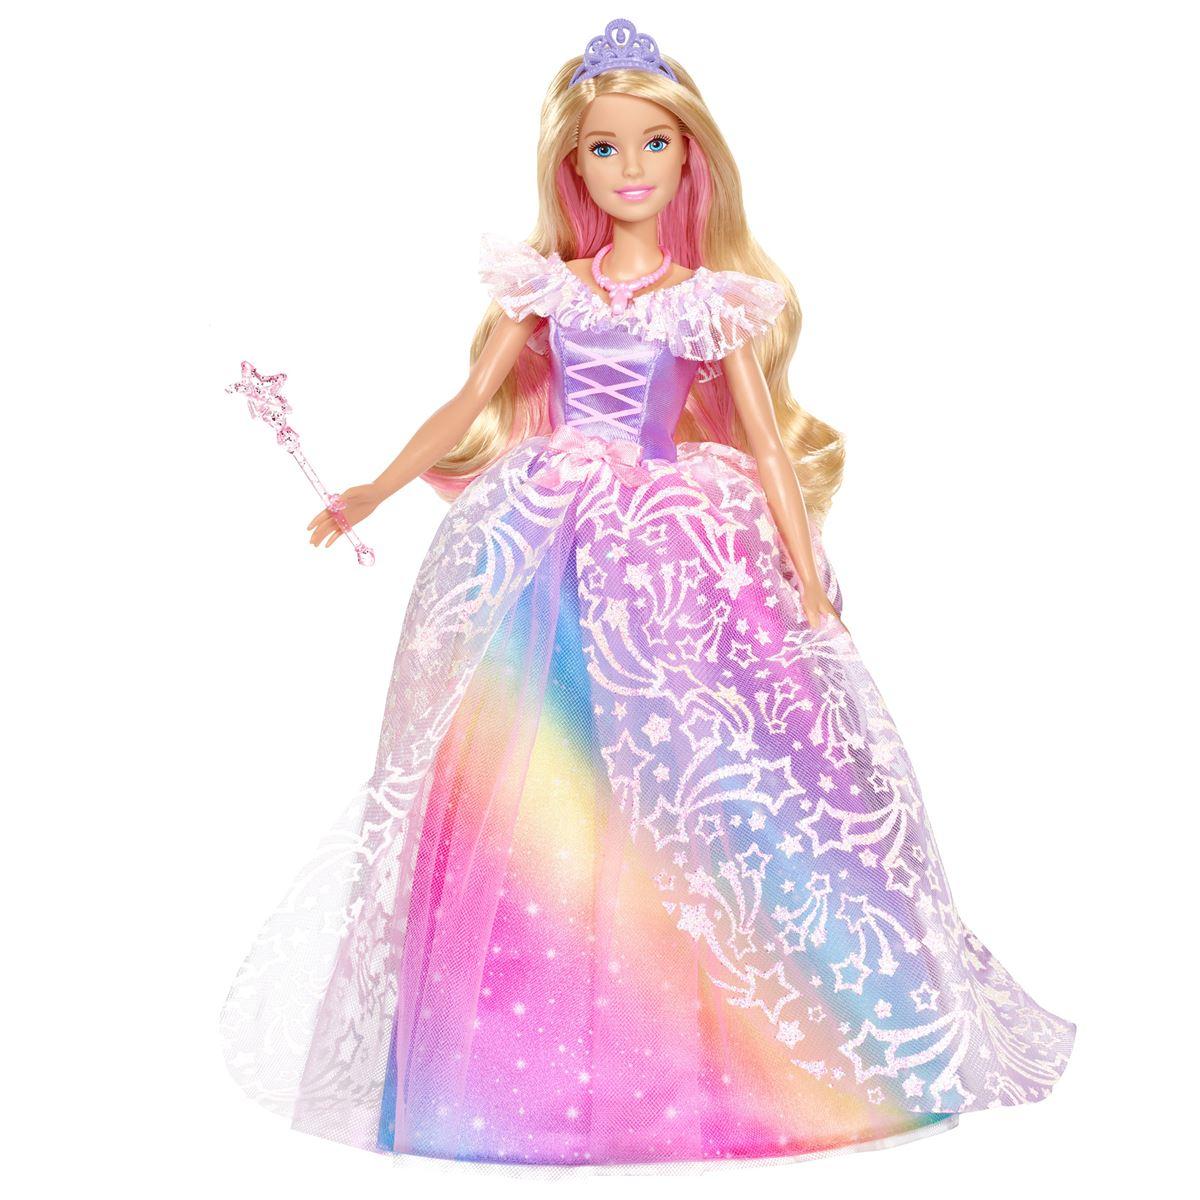 Barbie - Dreamtopia Prinsessa på kunglig bal